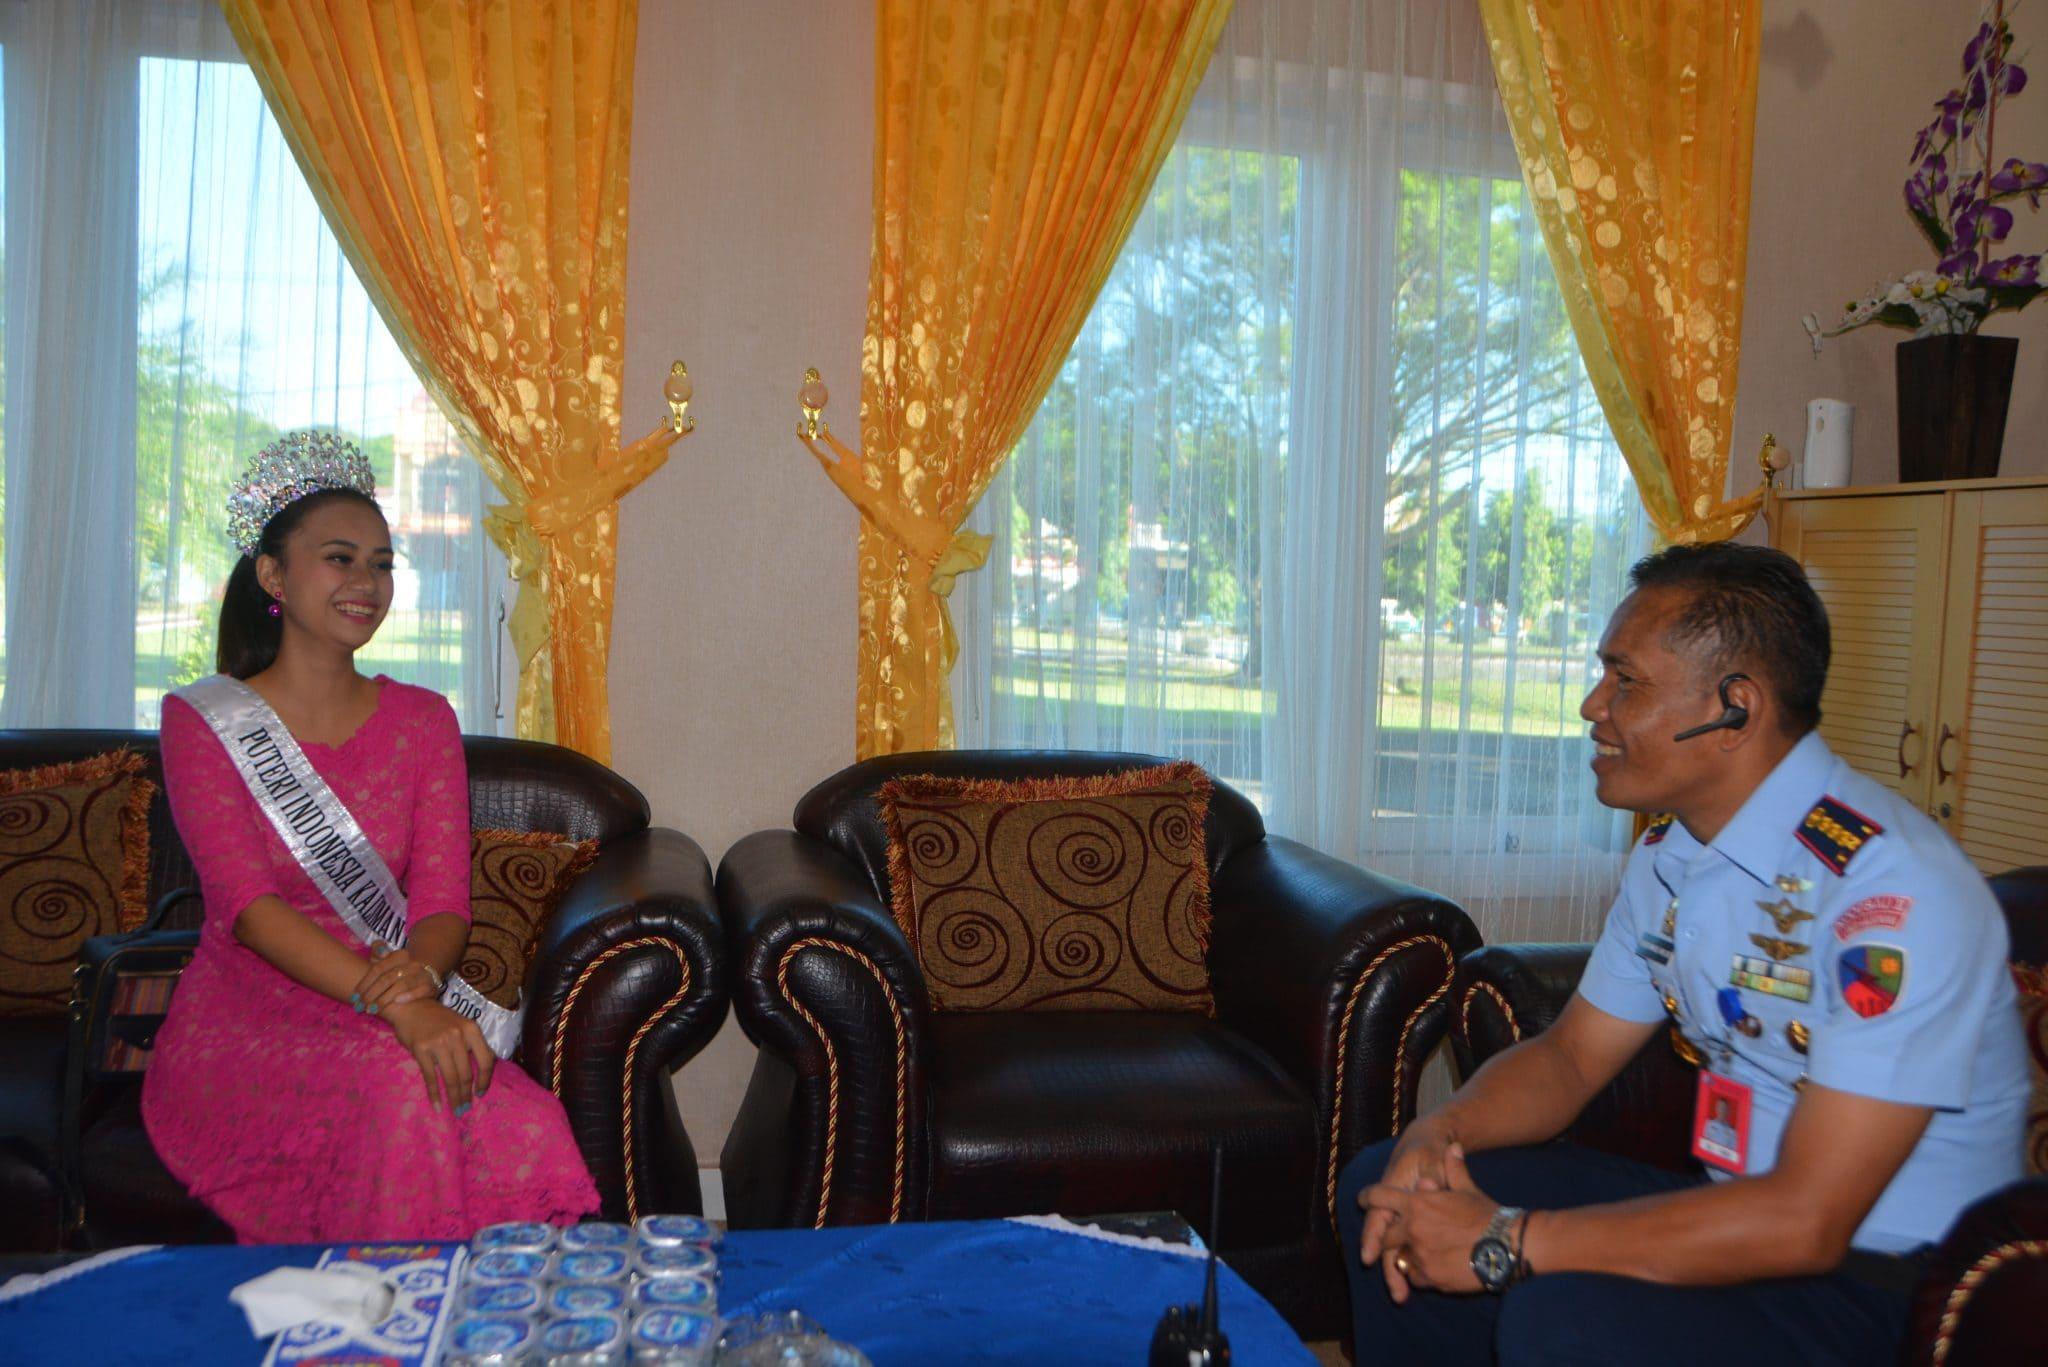 Putri Dirgantara 2017 Terpilih wakili Puteri Indonesia Kalimantan Timur